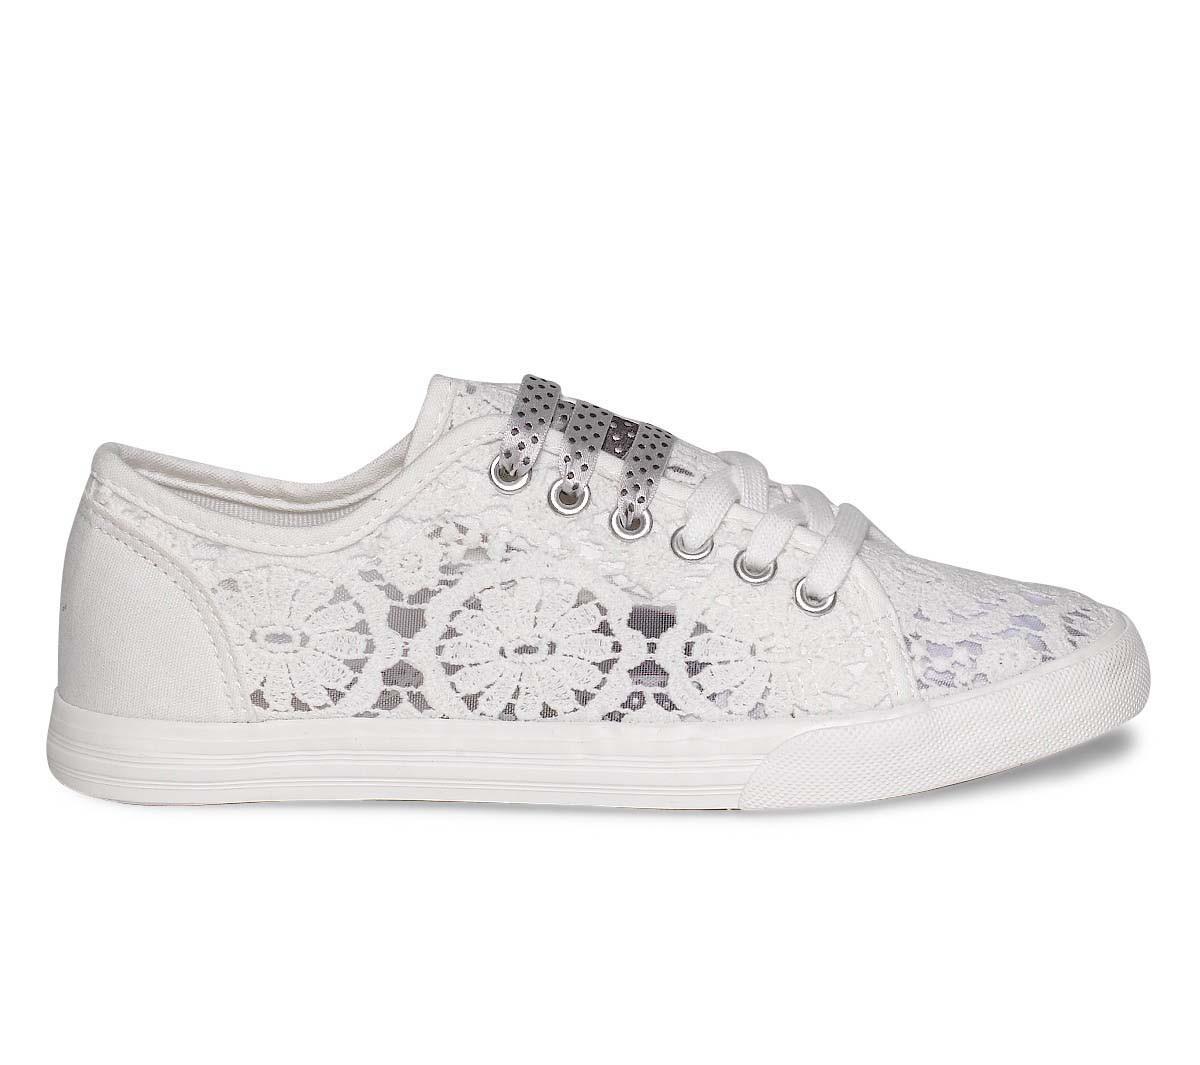 chaussure adidas femme basse blanche